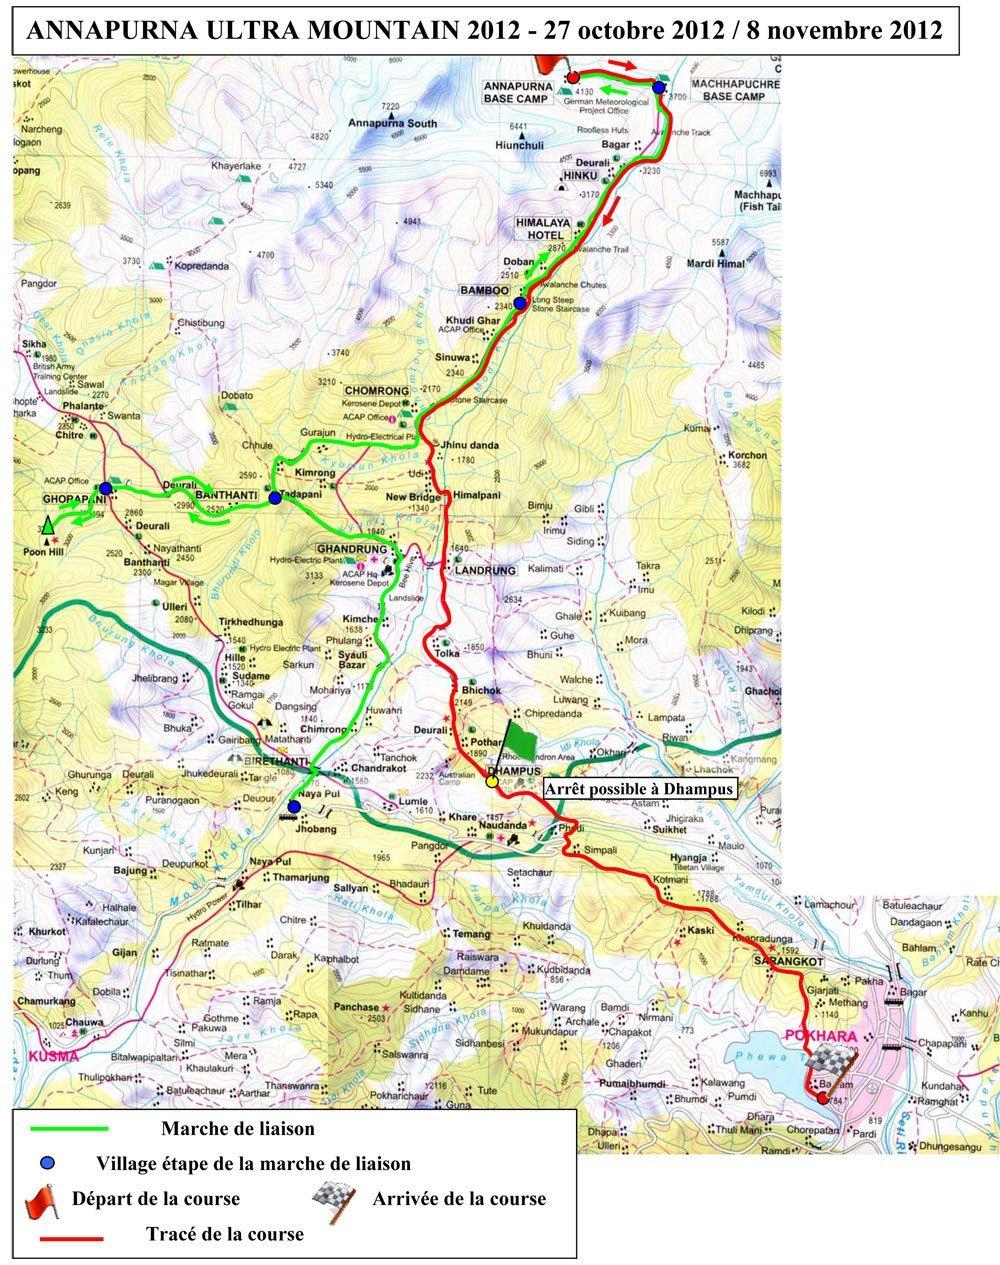 Annapurna-Ultra-Mountain-2012-parcours-course